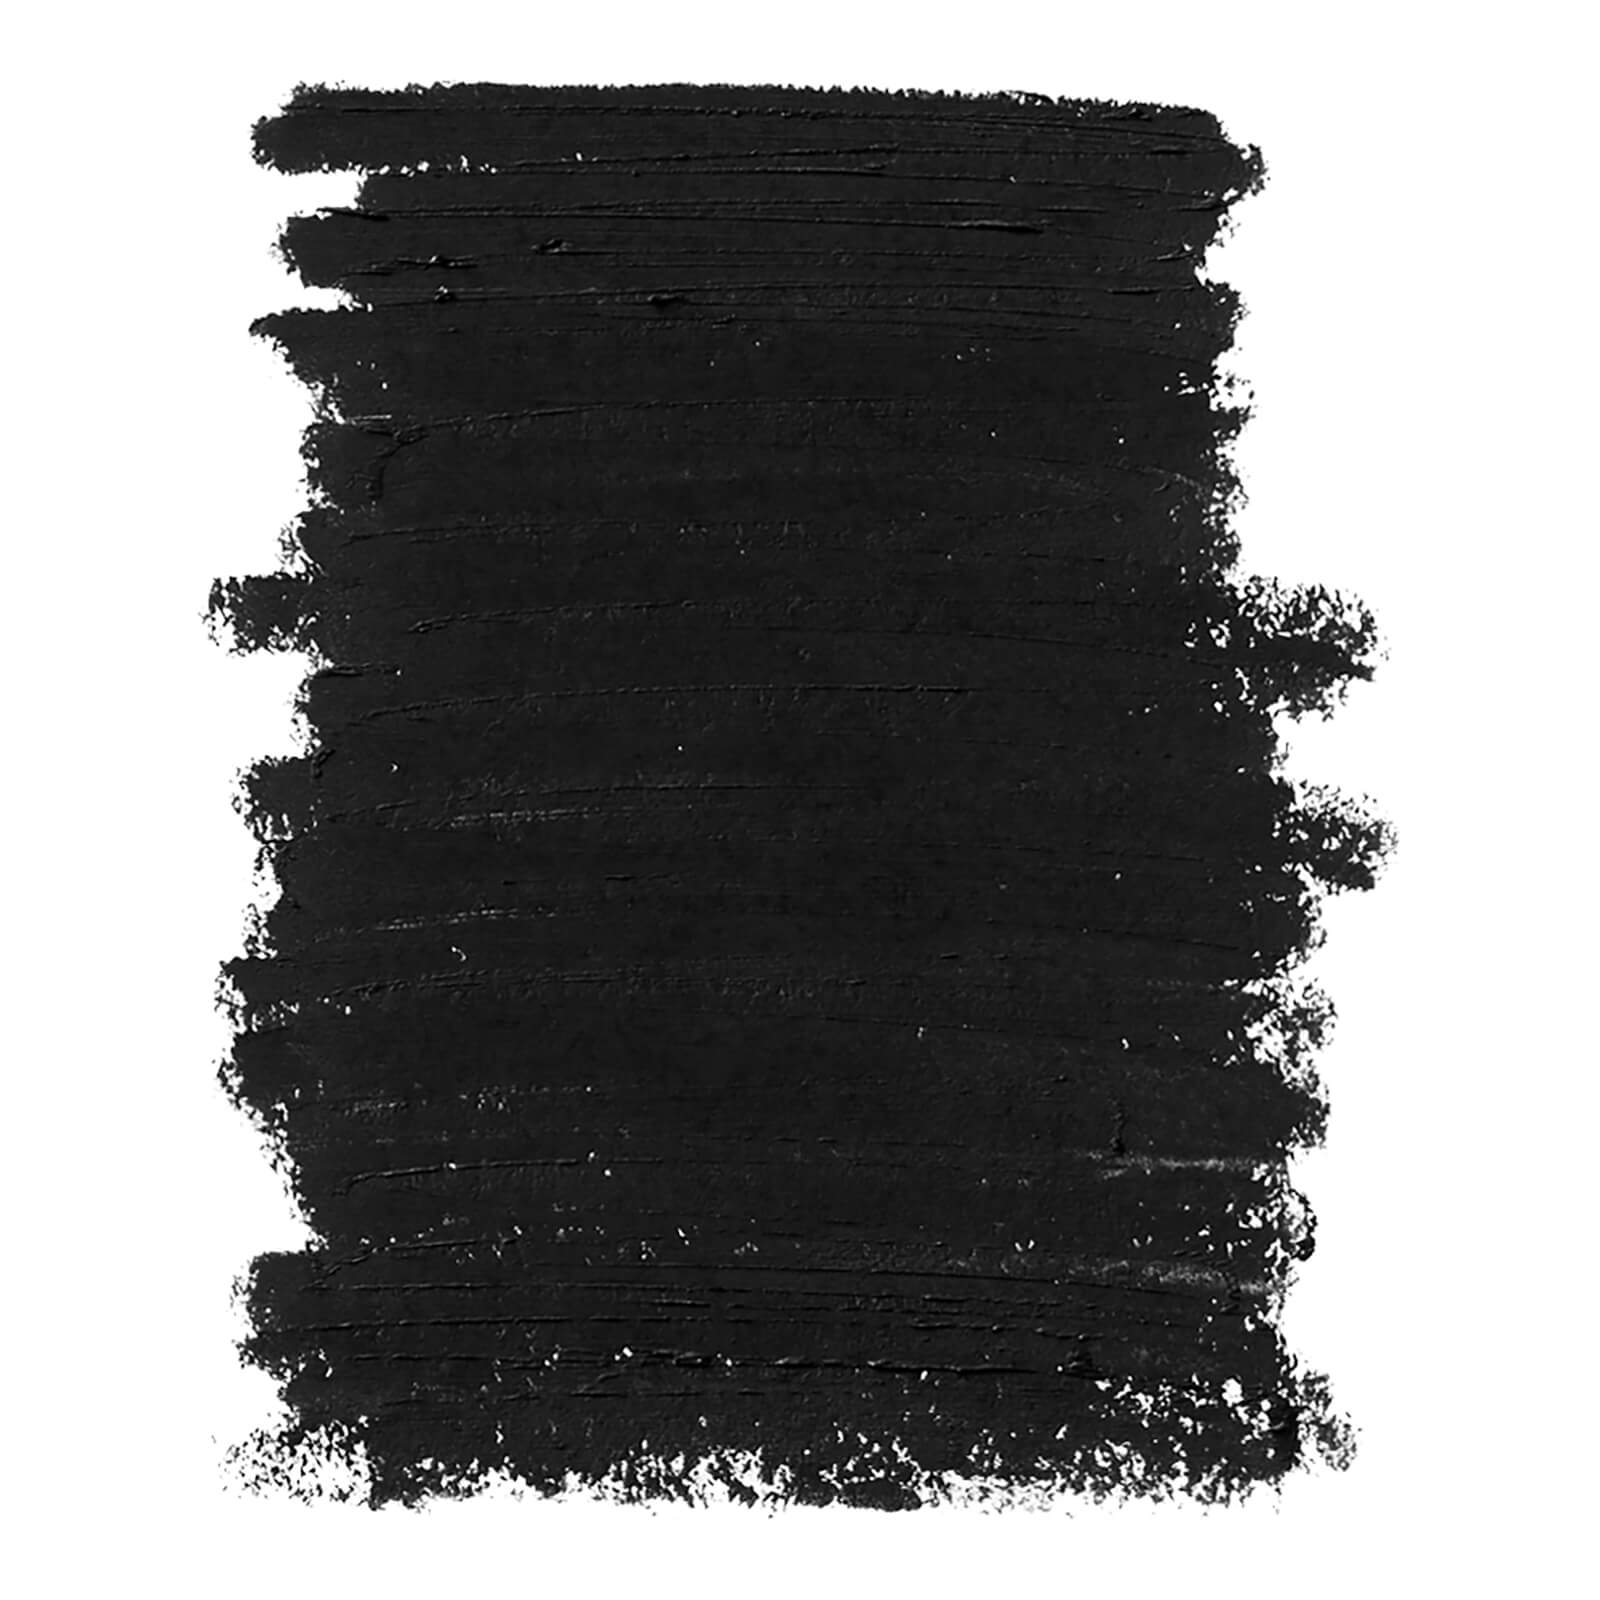 nyx professional makeup tres jolie gel pencil liner (various shades) - pitch black